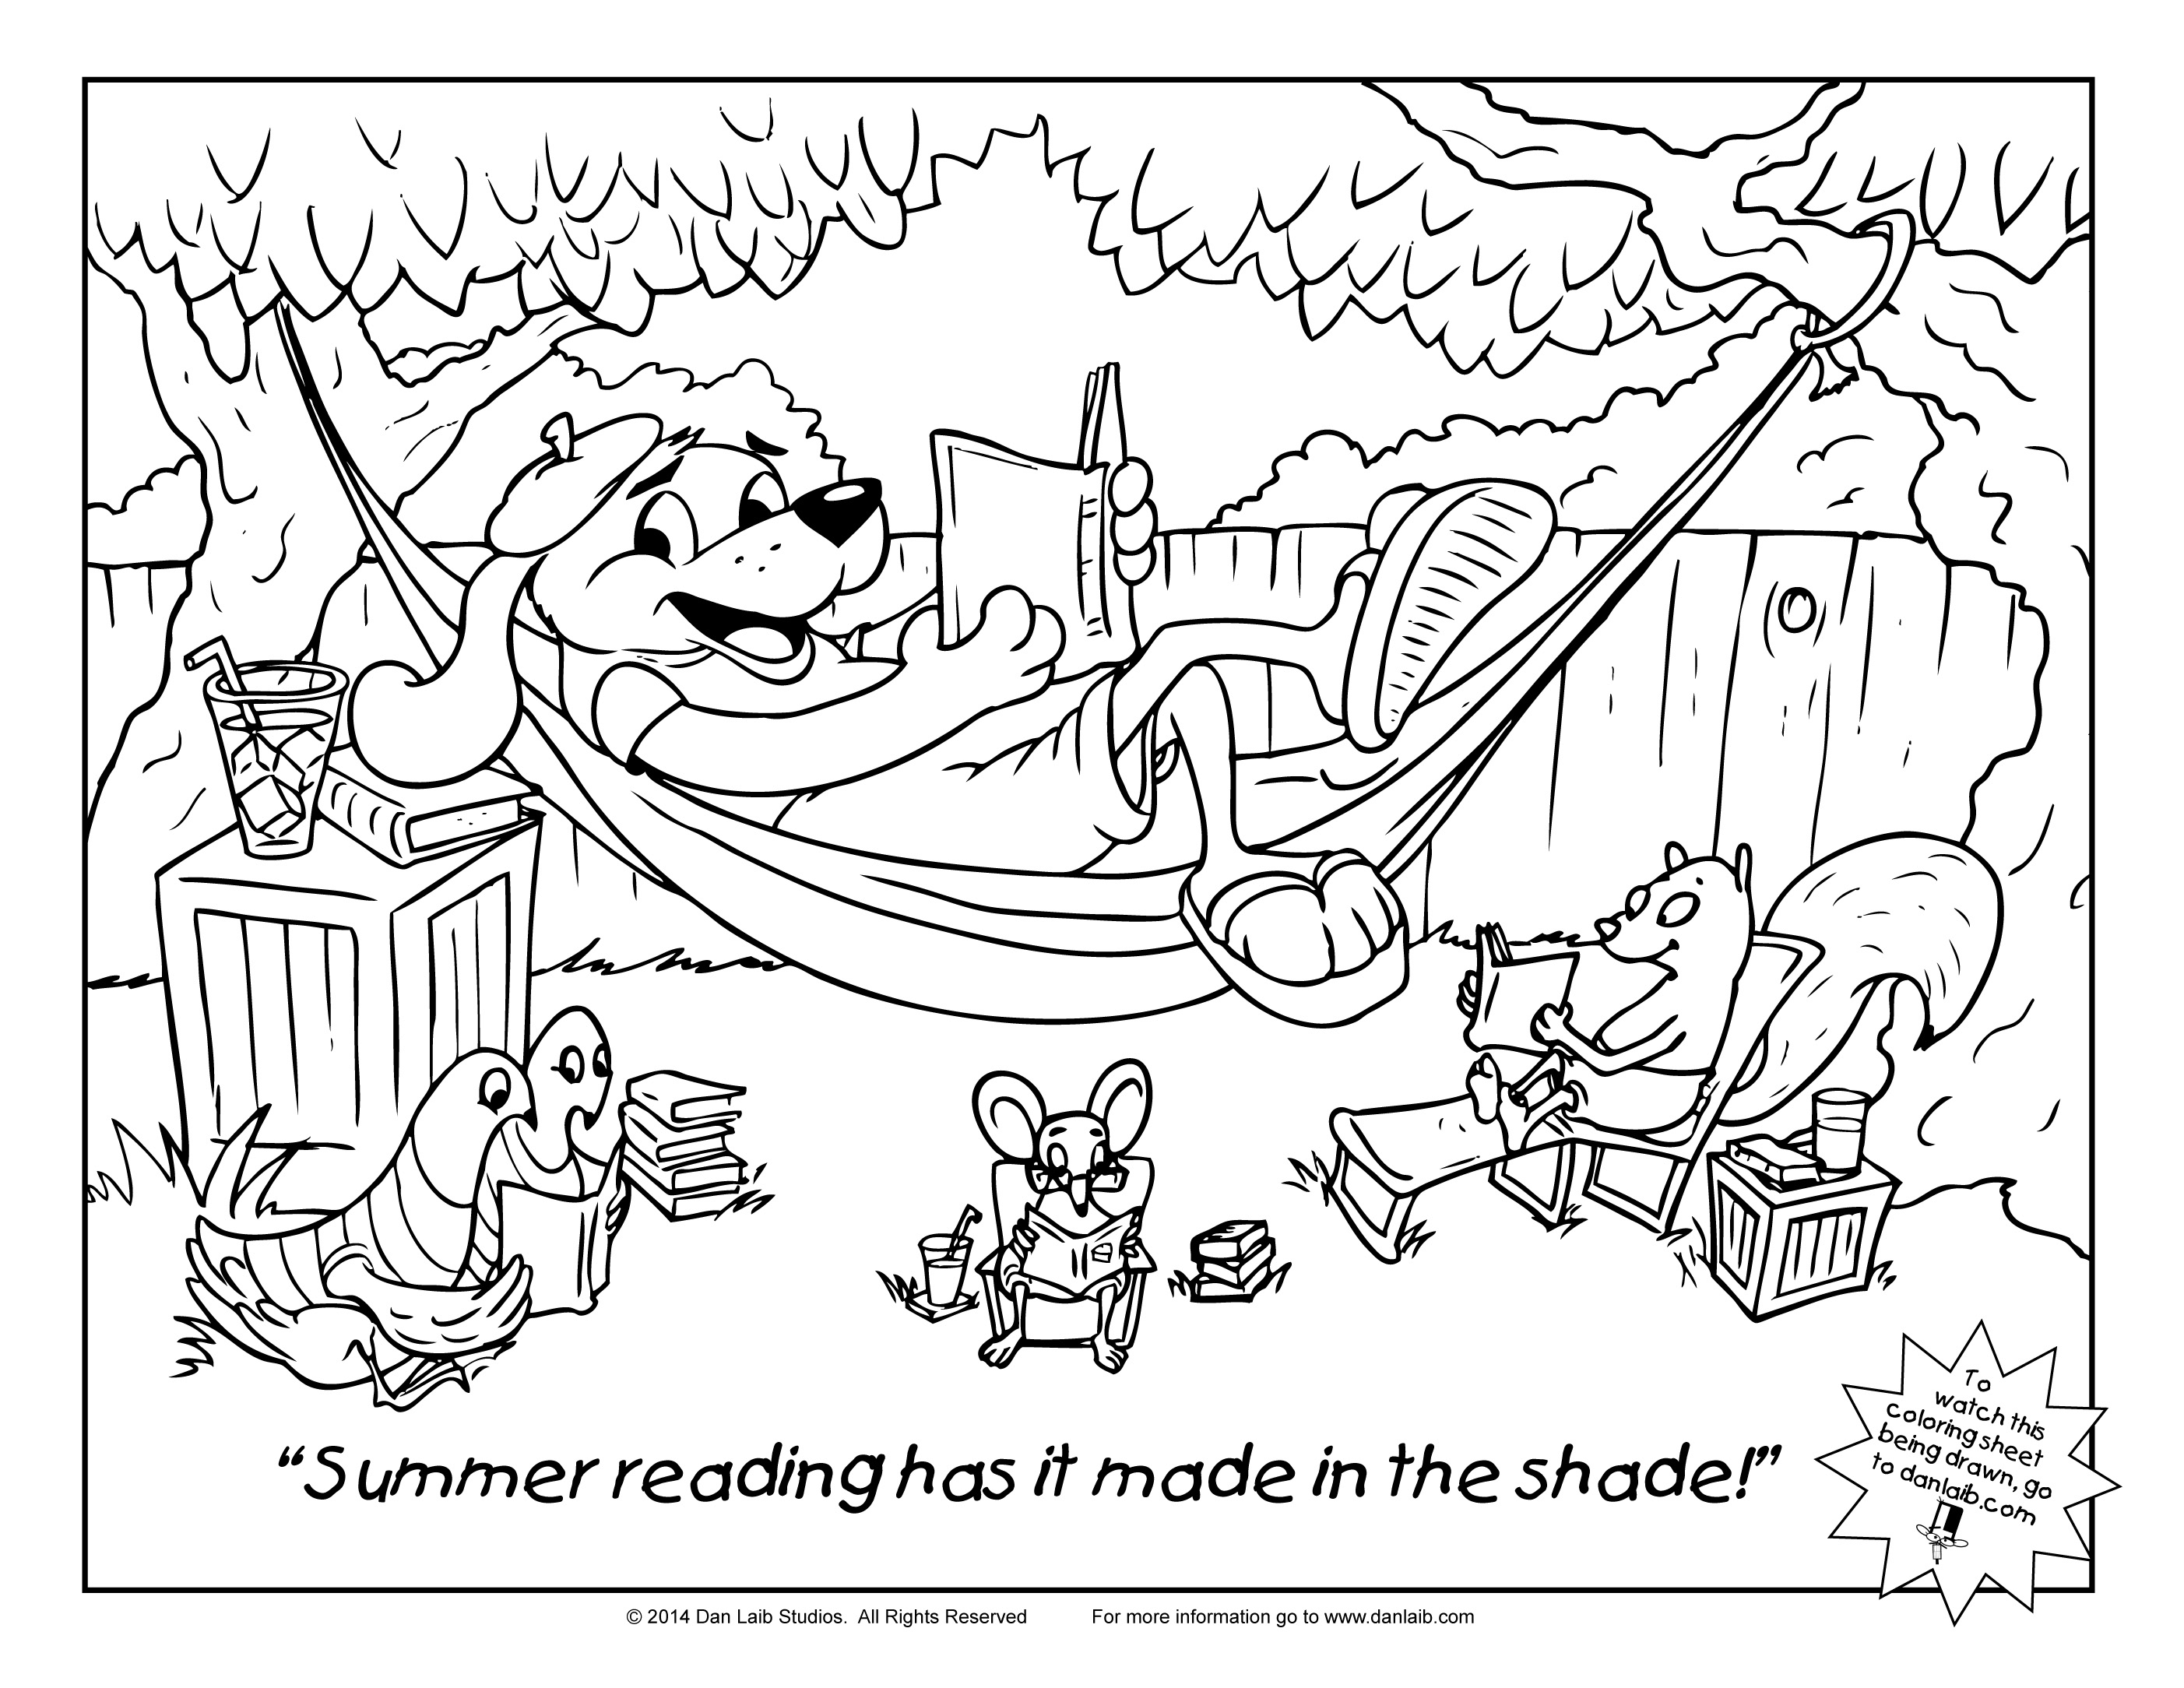 Coloring Sheet Summer Reading